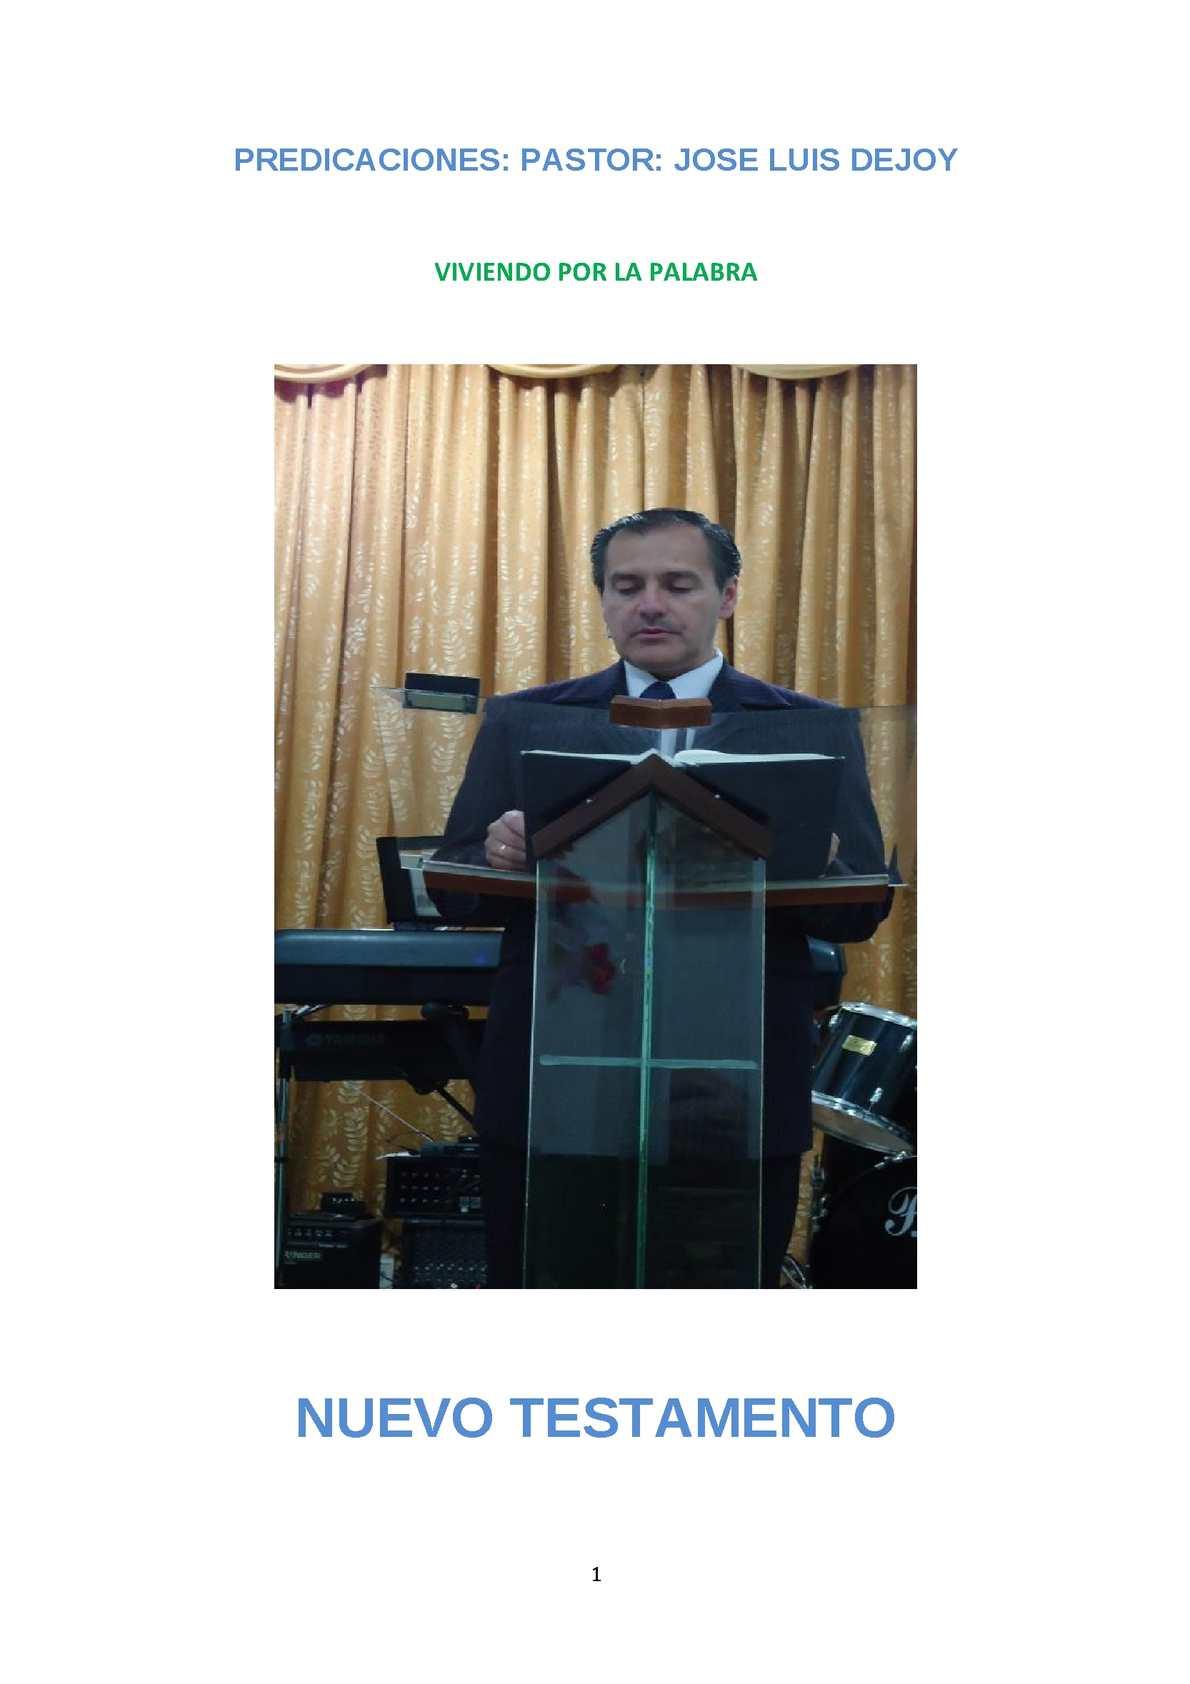 La Por Testamento PalabraNuevo Calaméo Viviendo eWHYID2Eb9